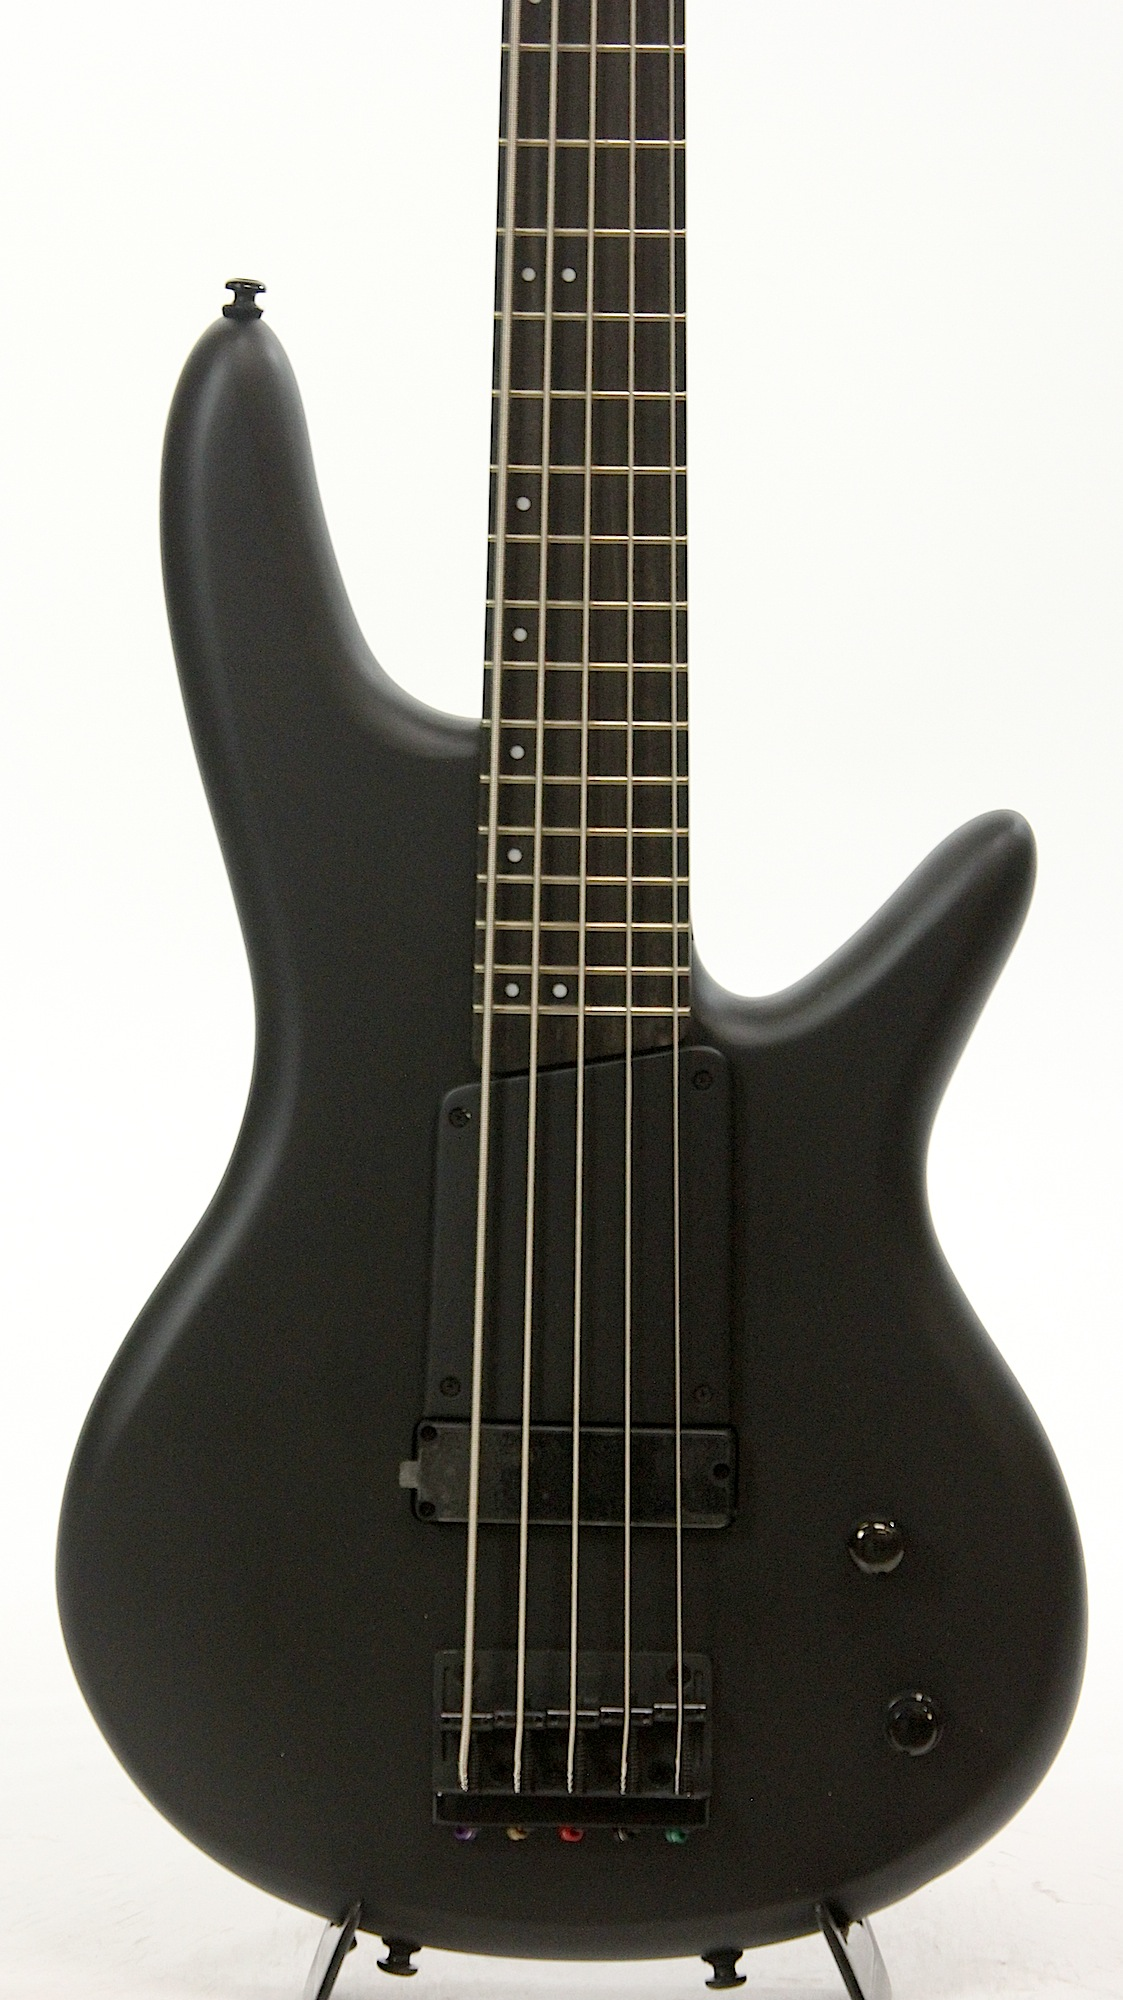 ibanez gwb35fd bkf gary willis black flat 5 string bass guitar 6. Black Bedroom Furniture Sets. Home Design Ideas